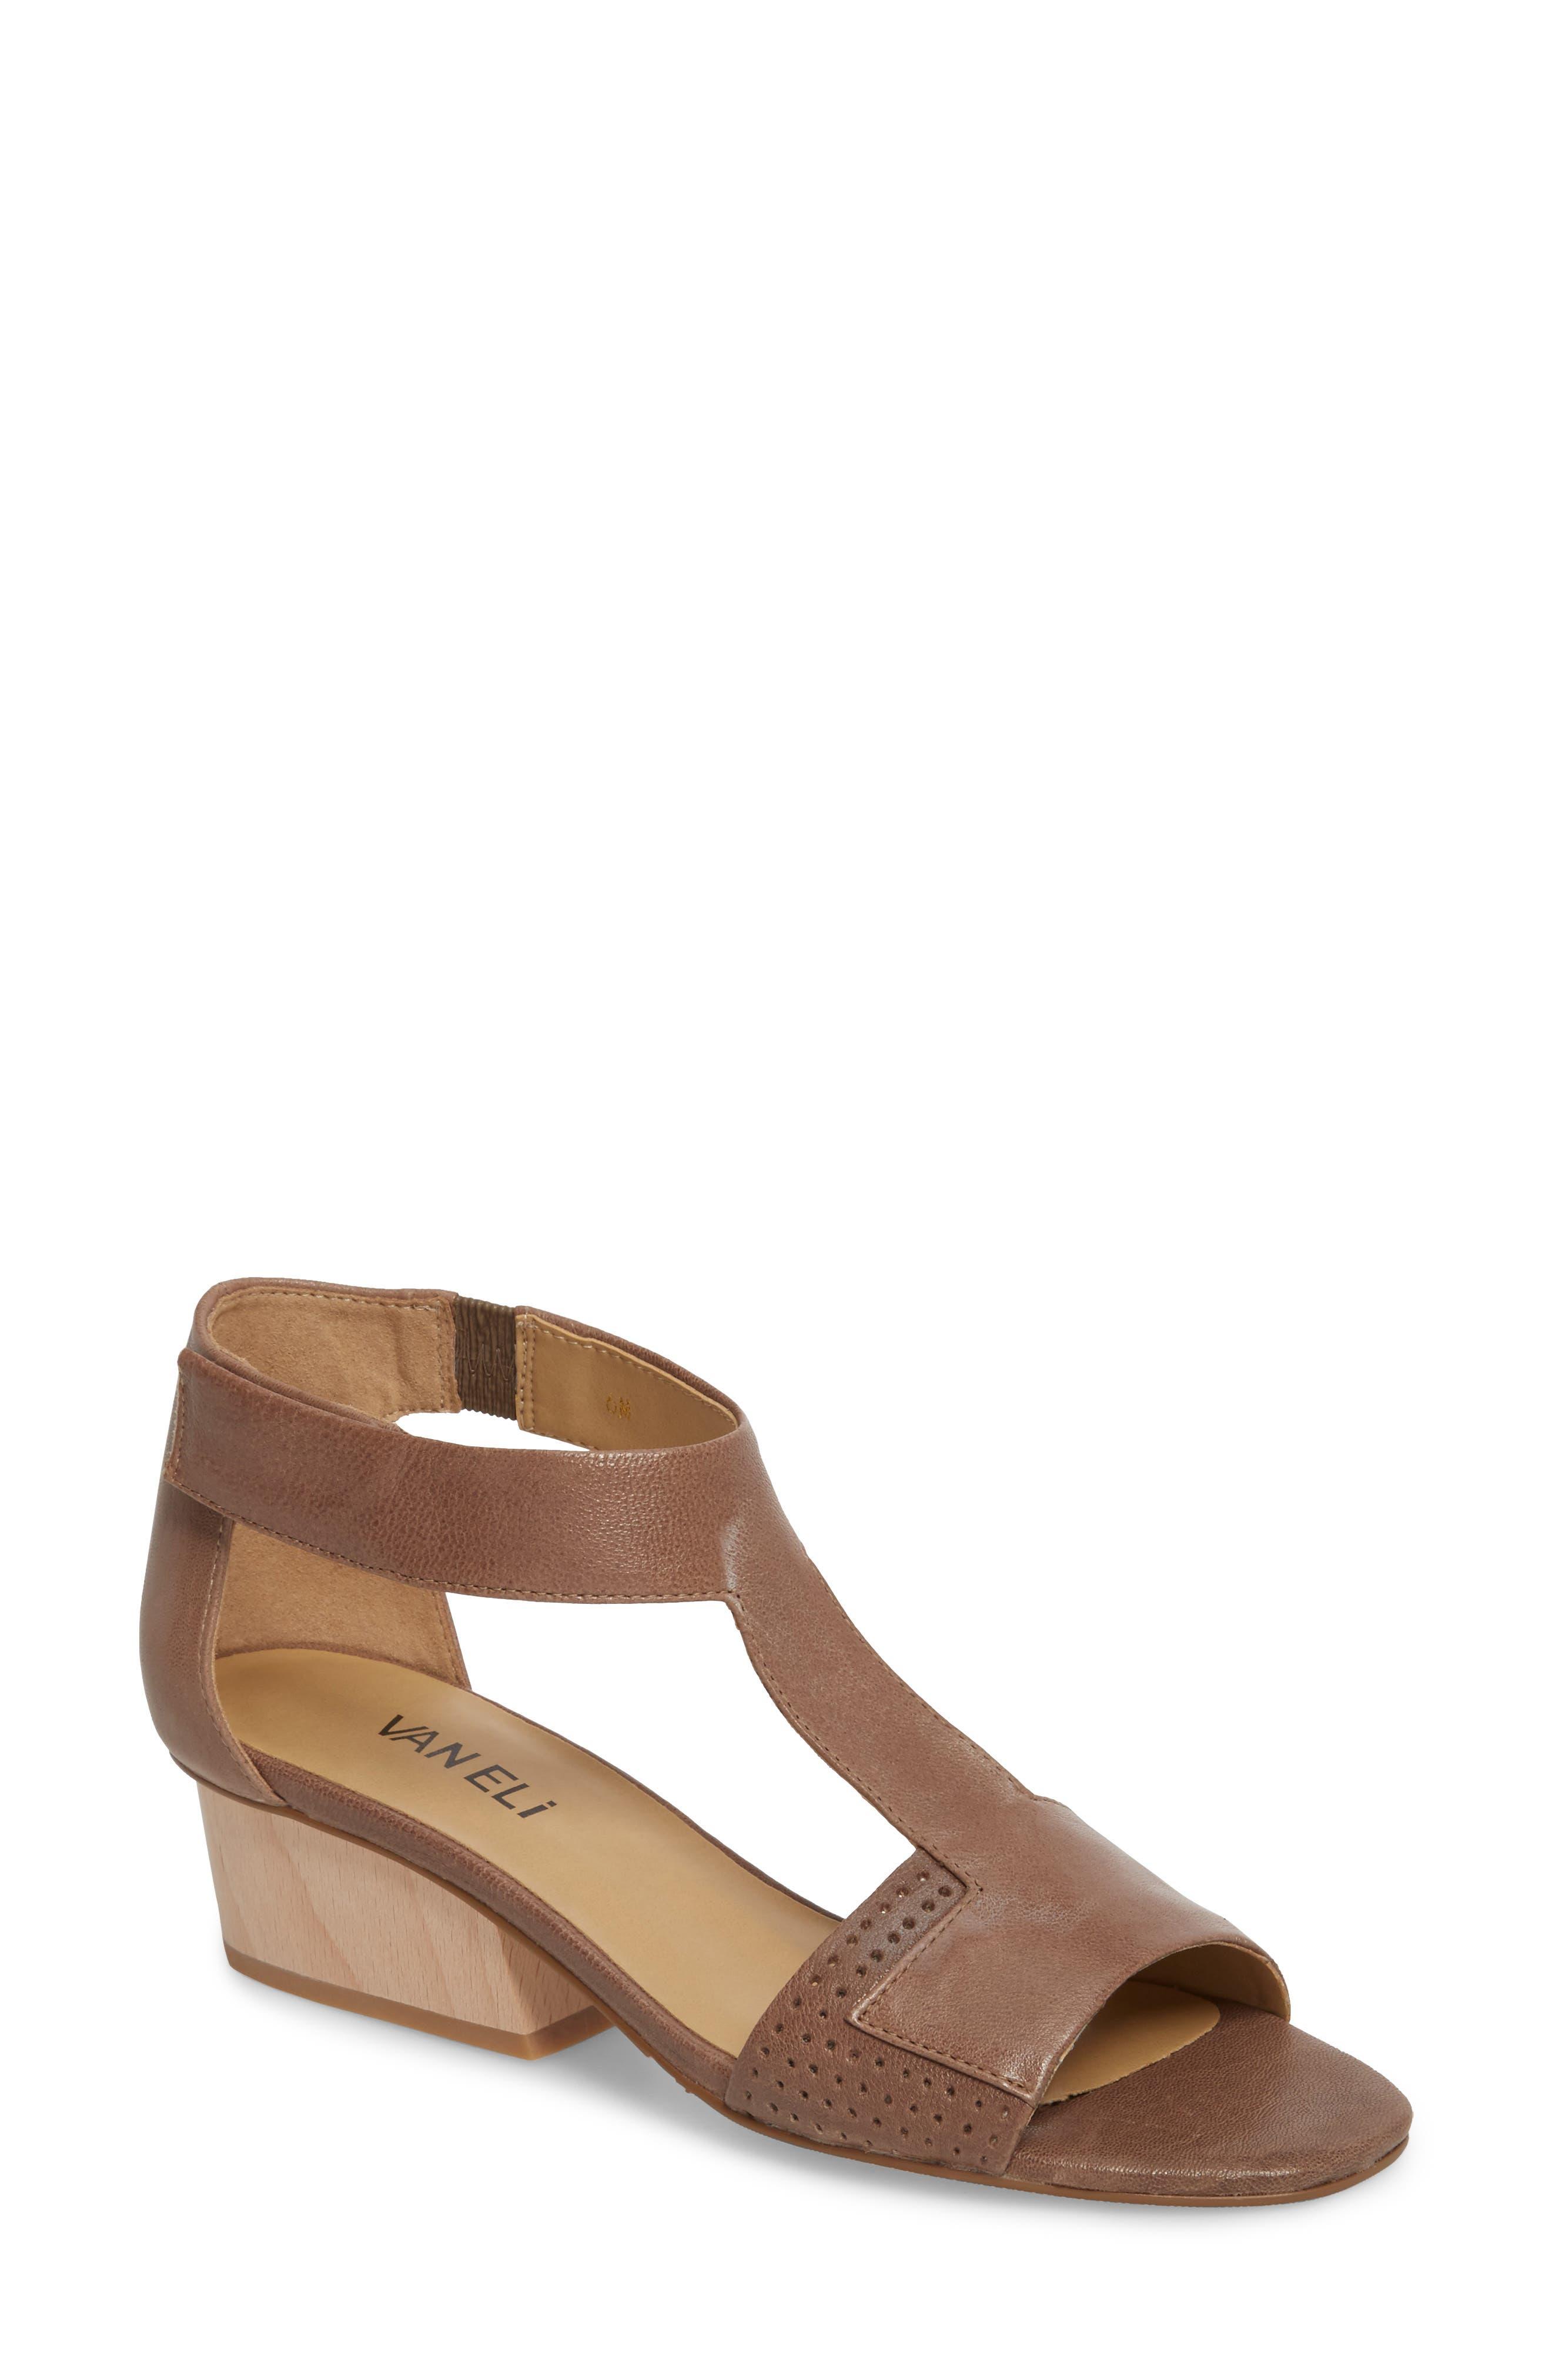 VANELI Calyx Block Heel Sandal, Main, color, STONE LEATHER